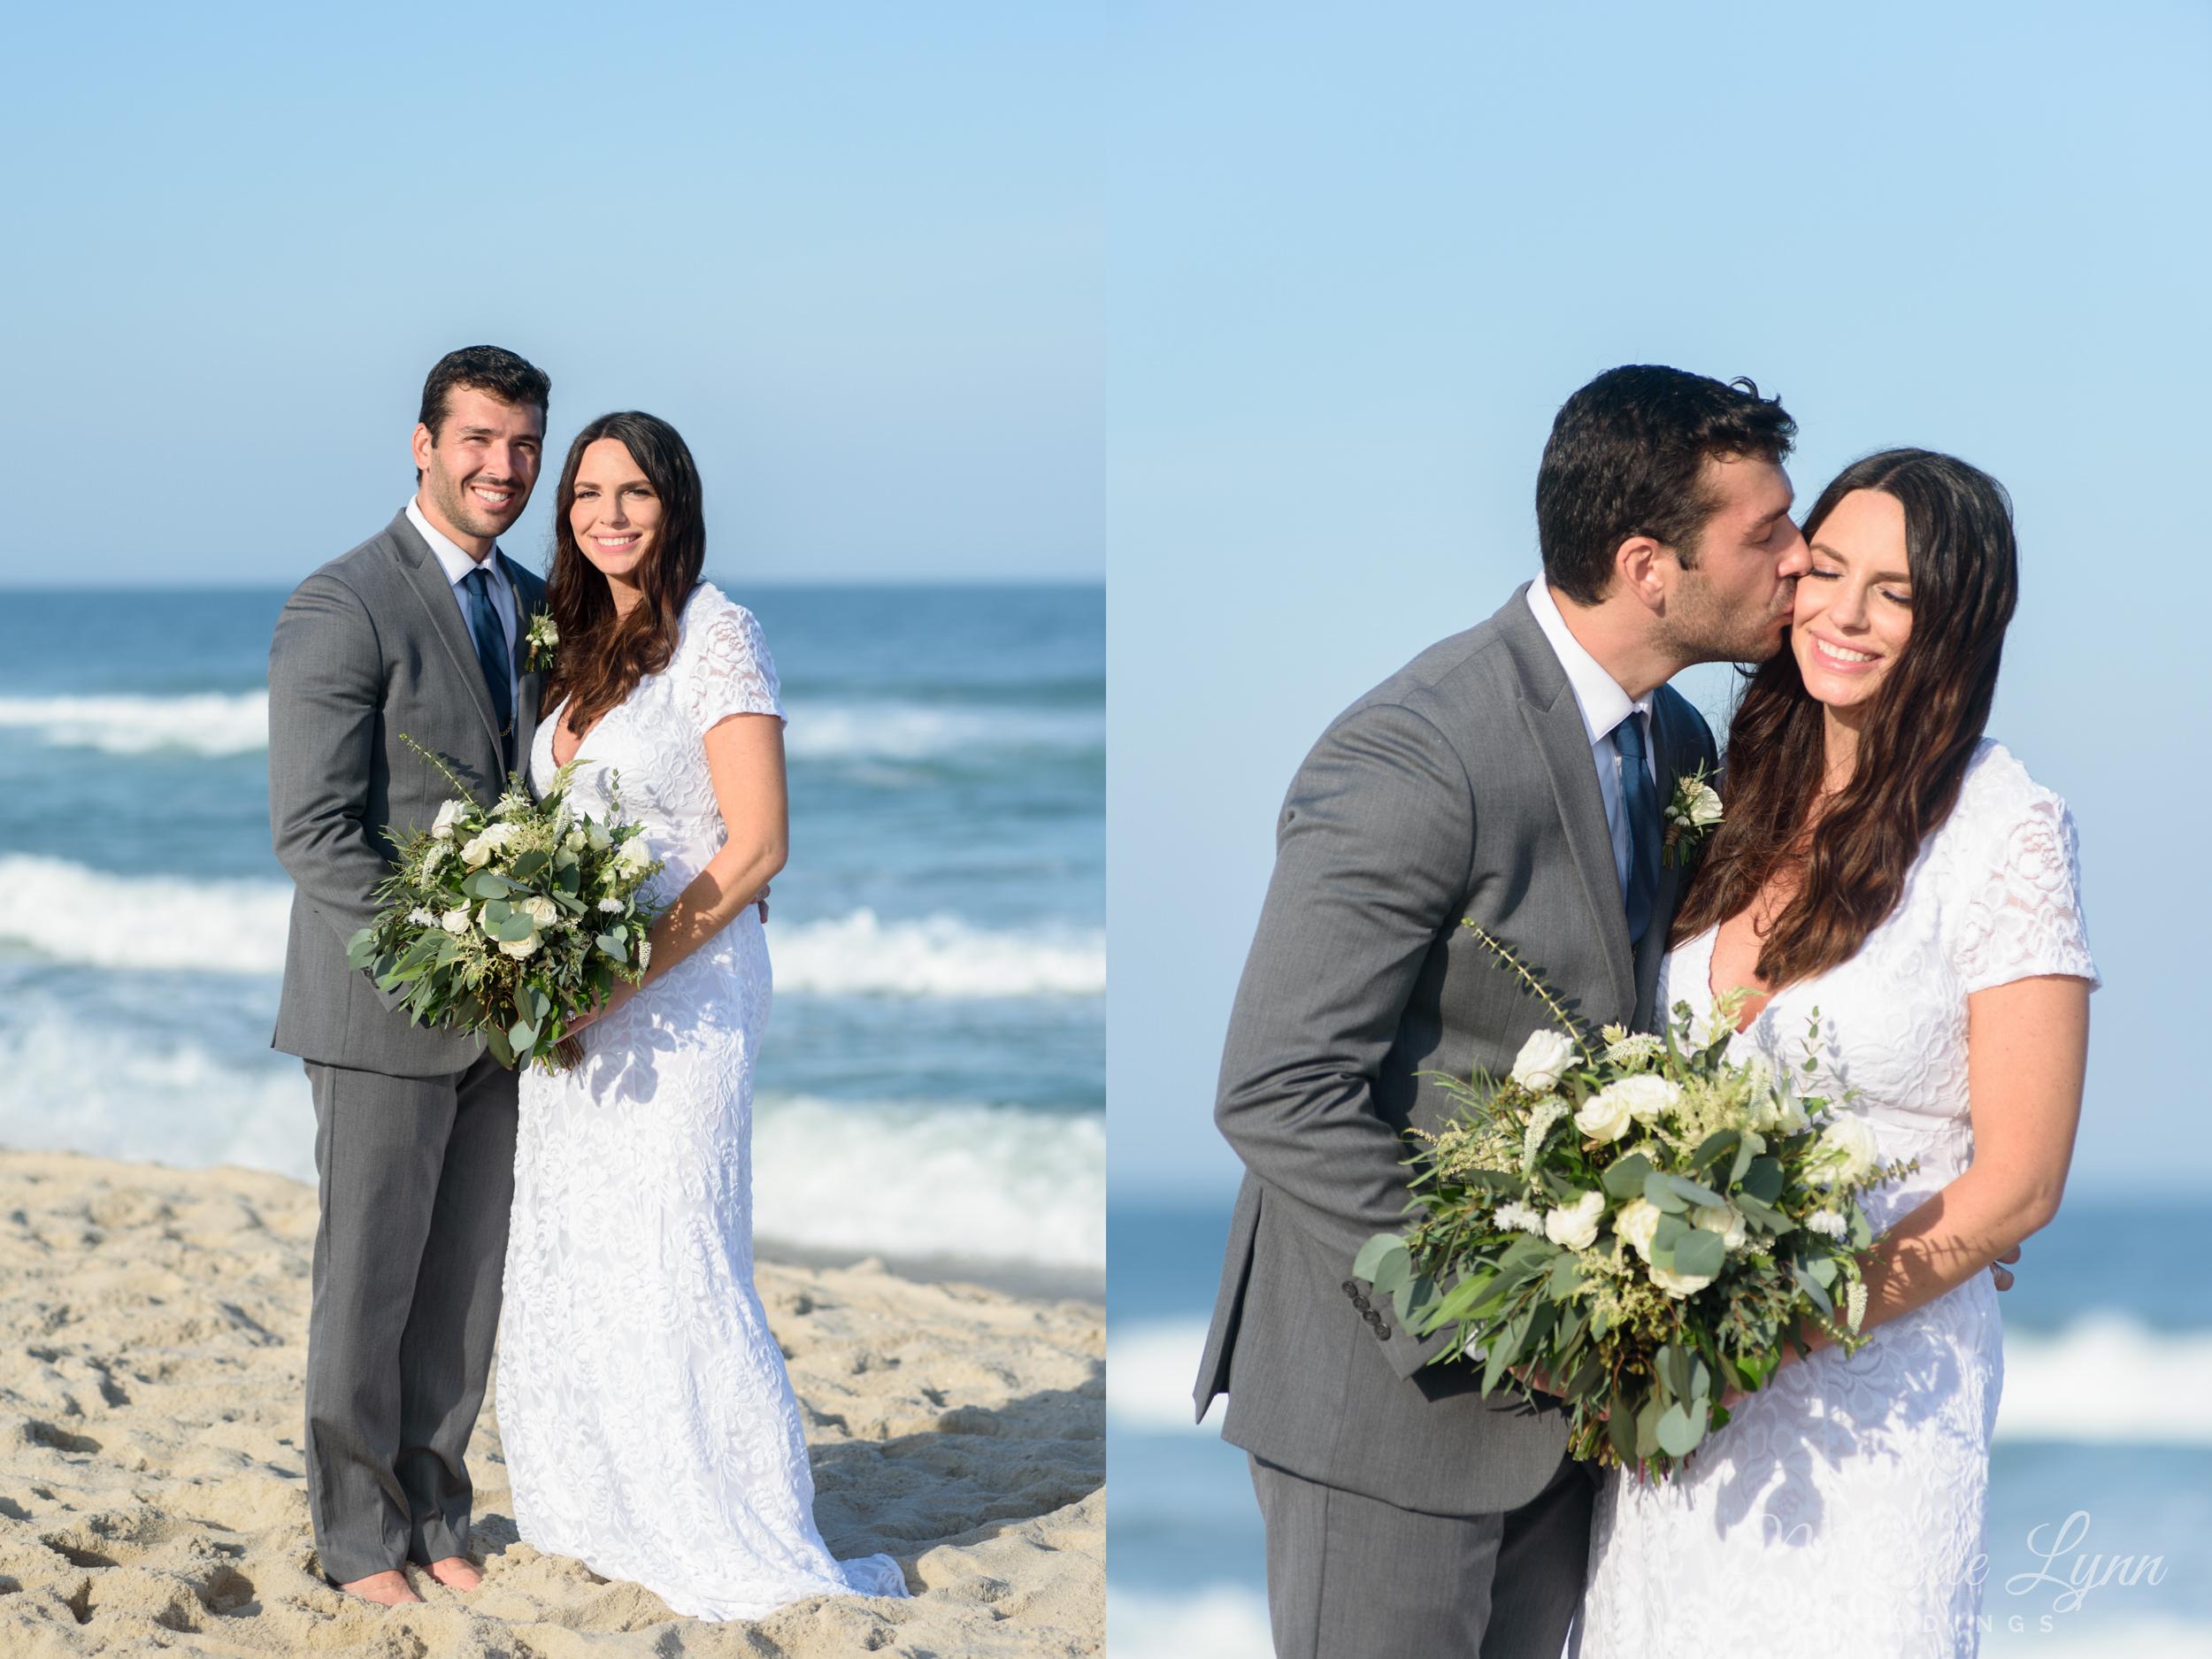 mlw-long-beach-island-new-jersey-wedding-photography-6.jpg